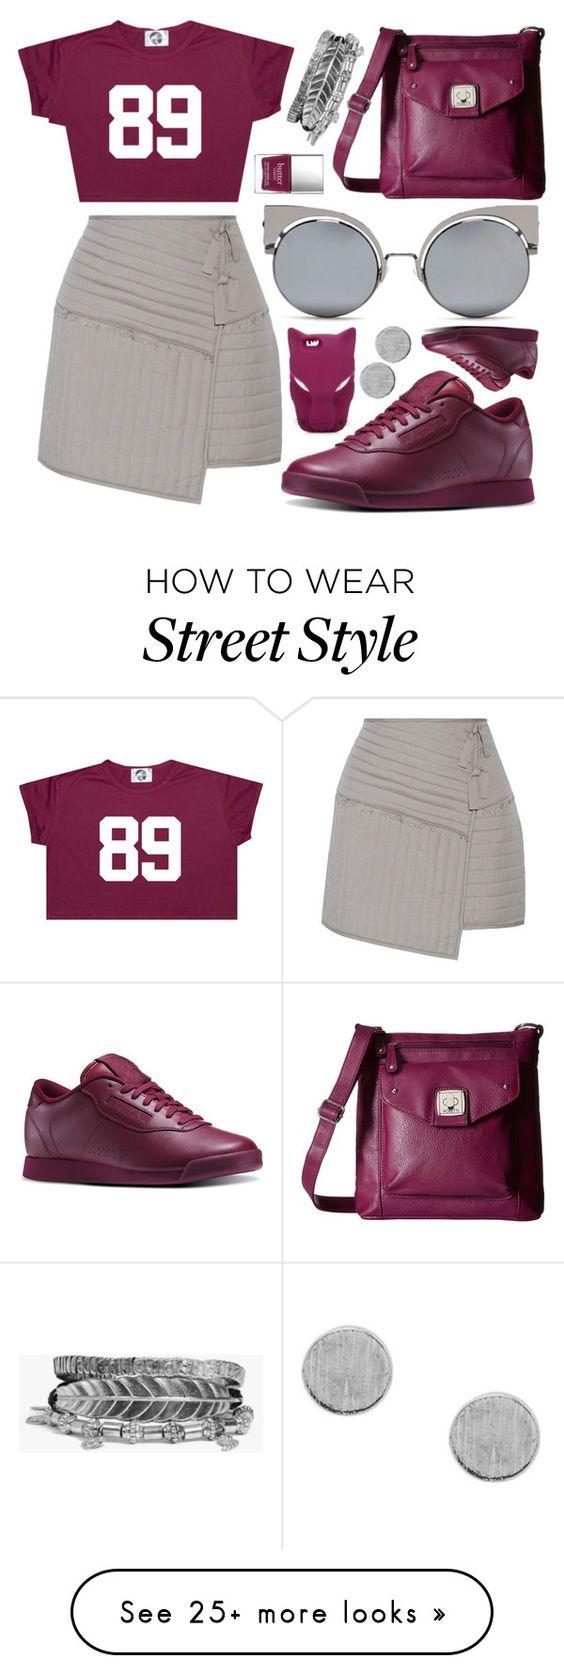 """...sporty street style..."" by sanela-enter on Polyvore featuring TIBI, Reebok, Rosetti, Fendi, STELLA McCARTNEY, Boohoo and Butter London"